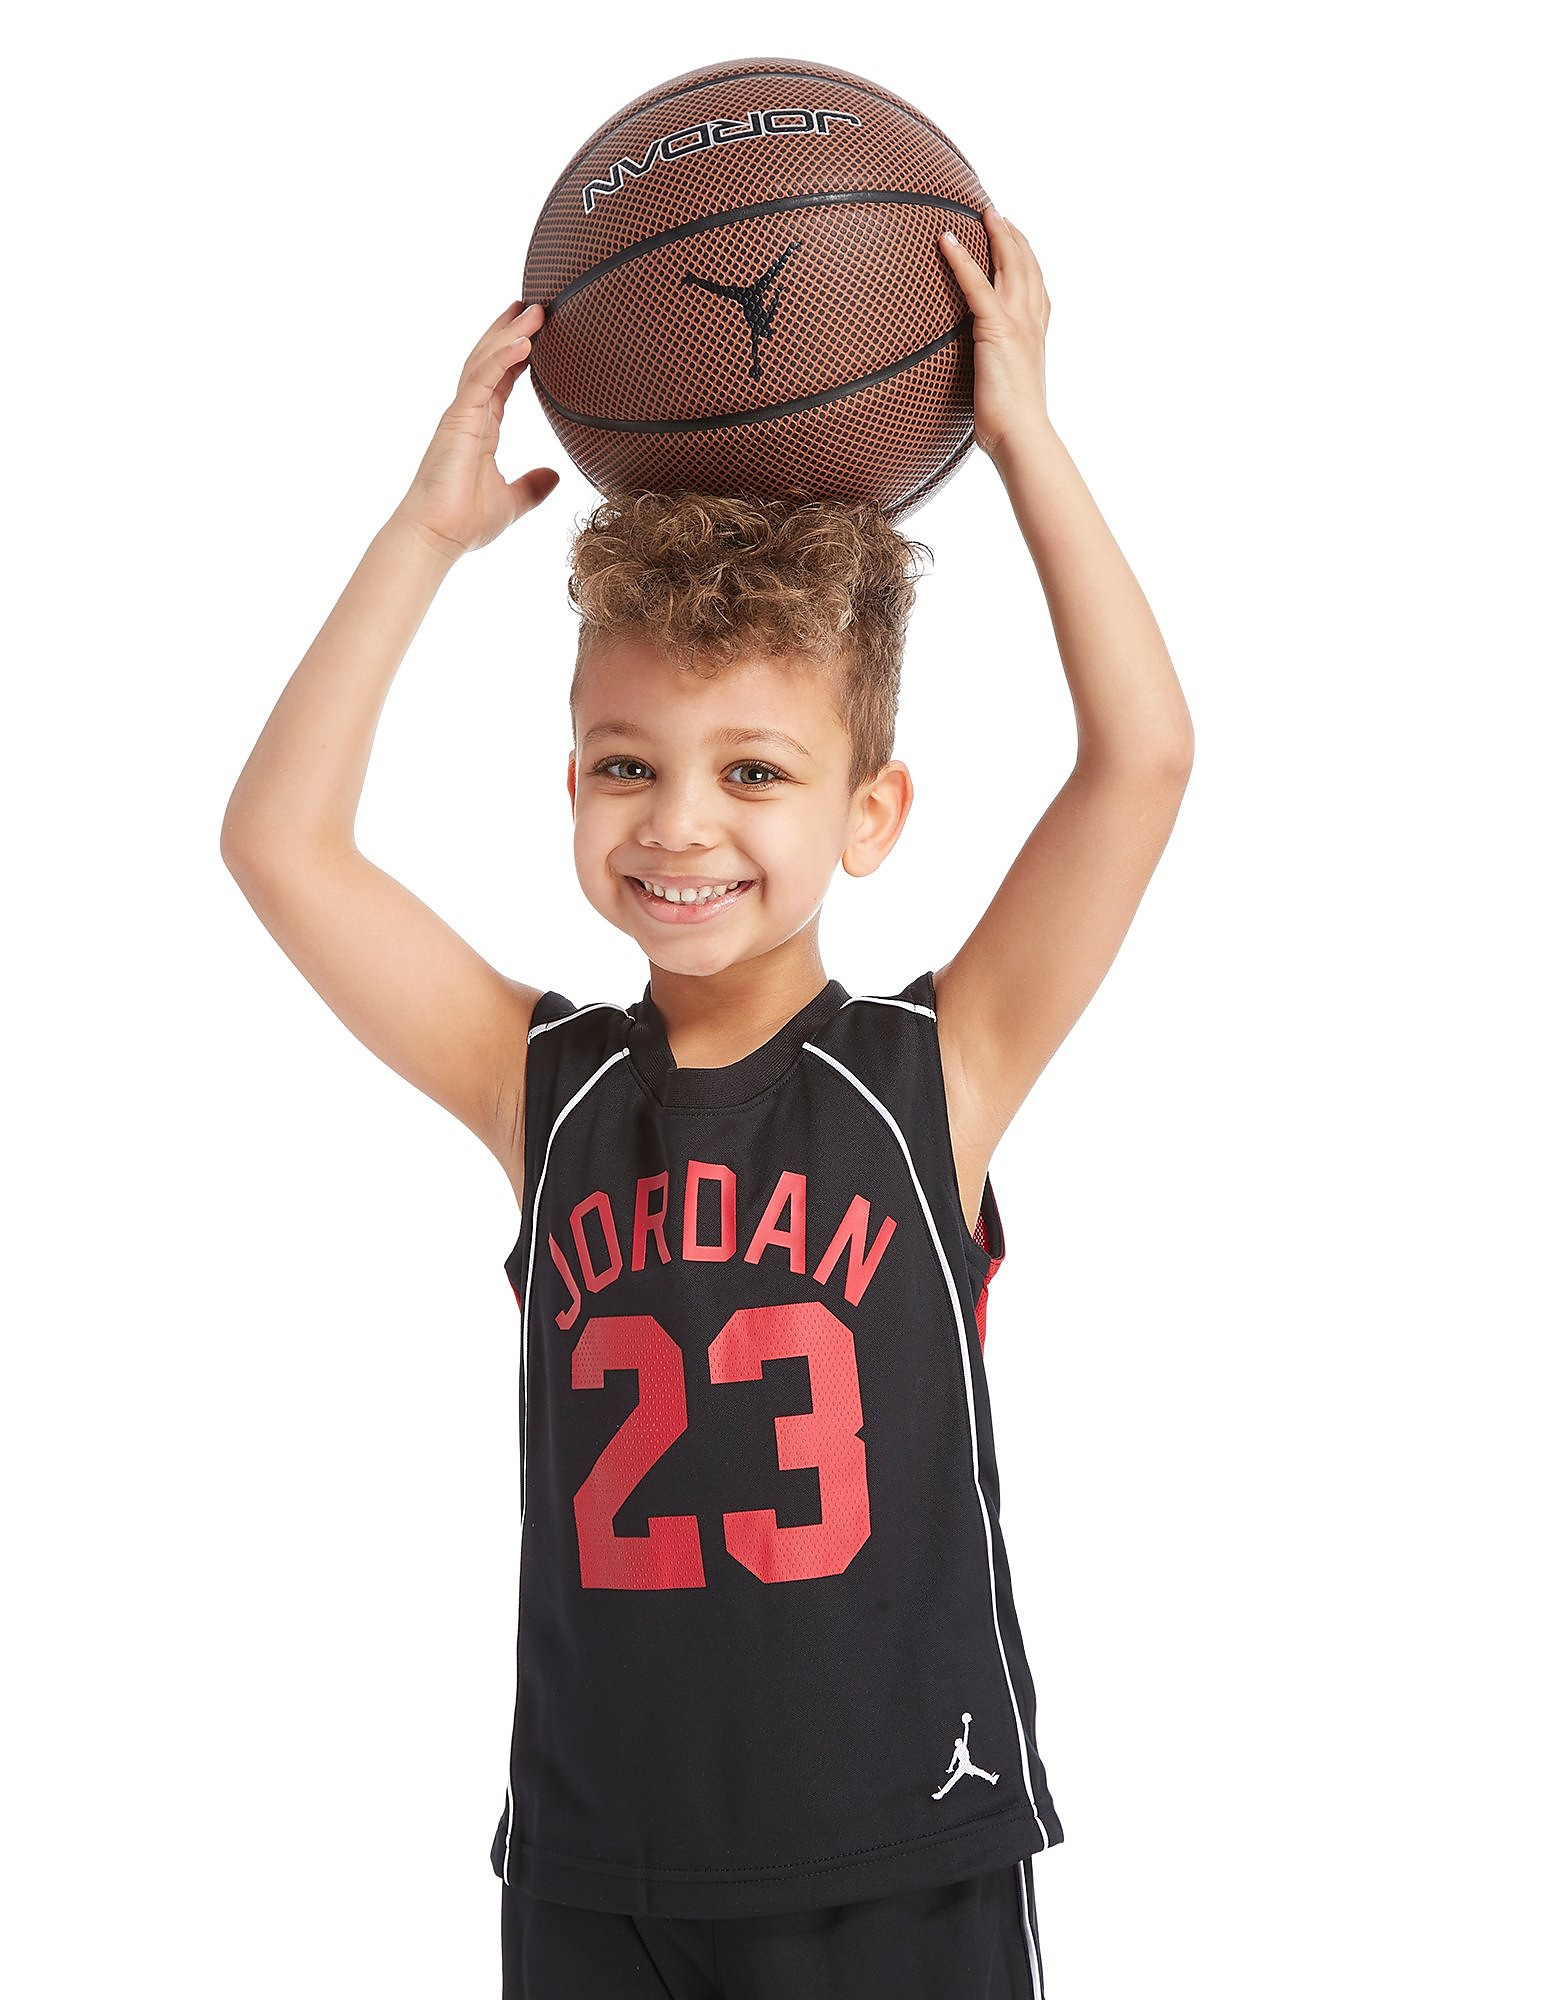 Jordan Air 23 Set Children